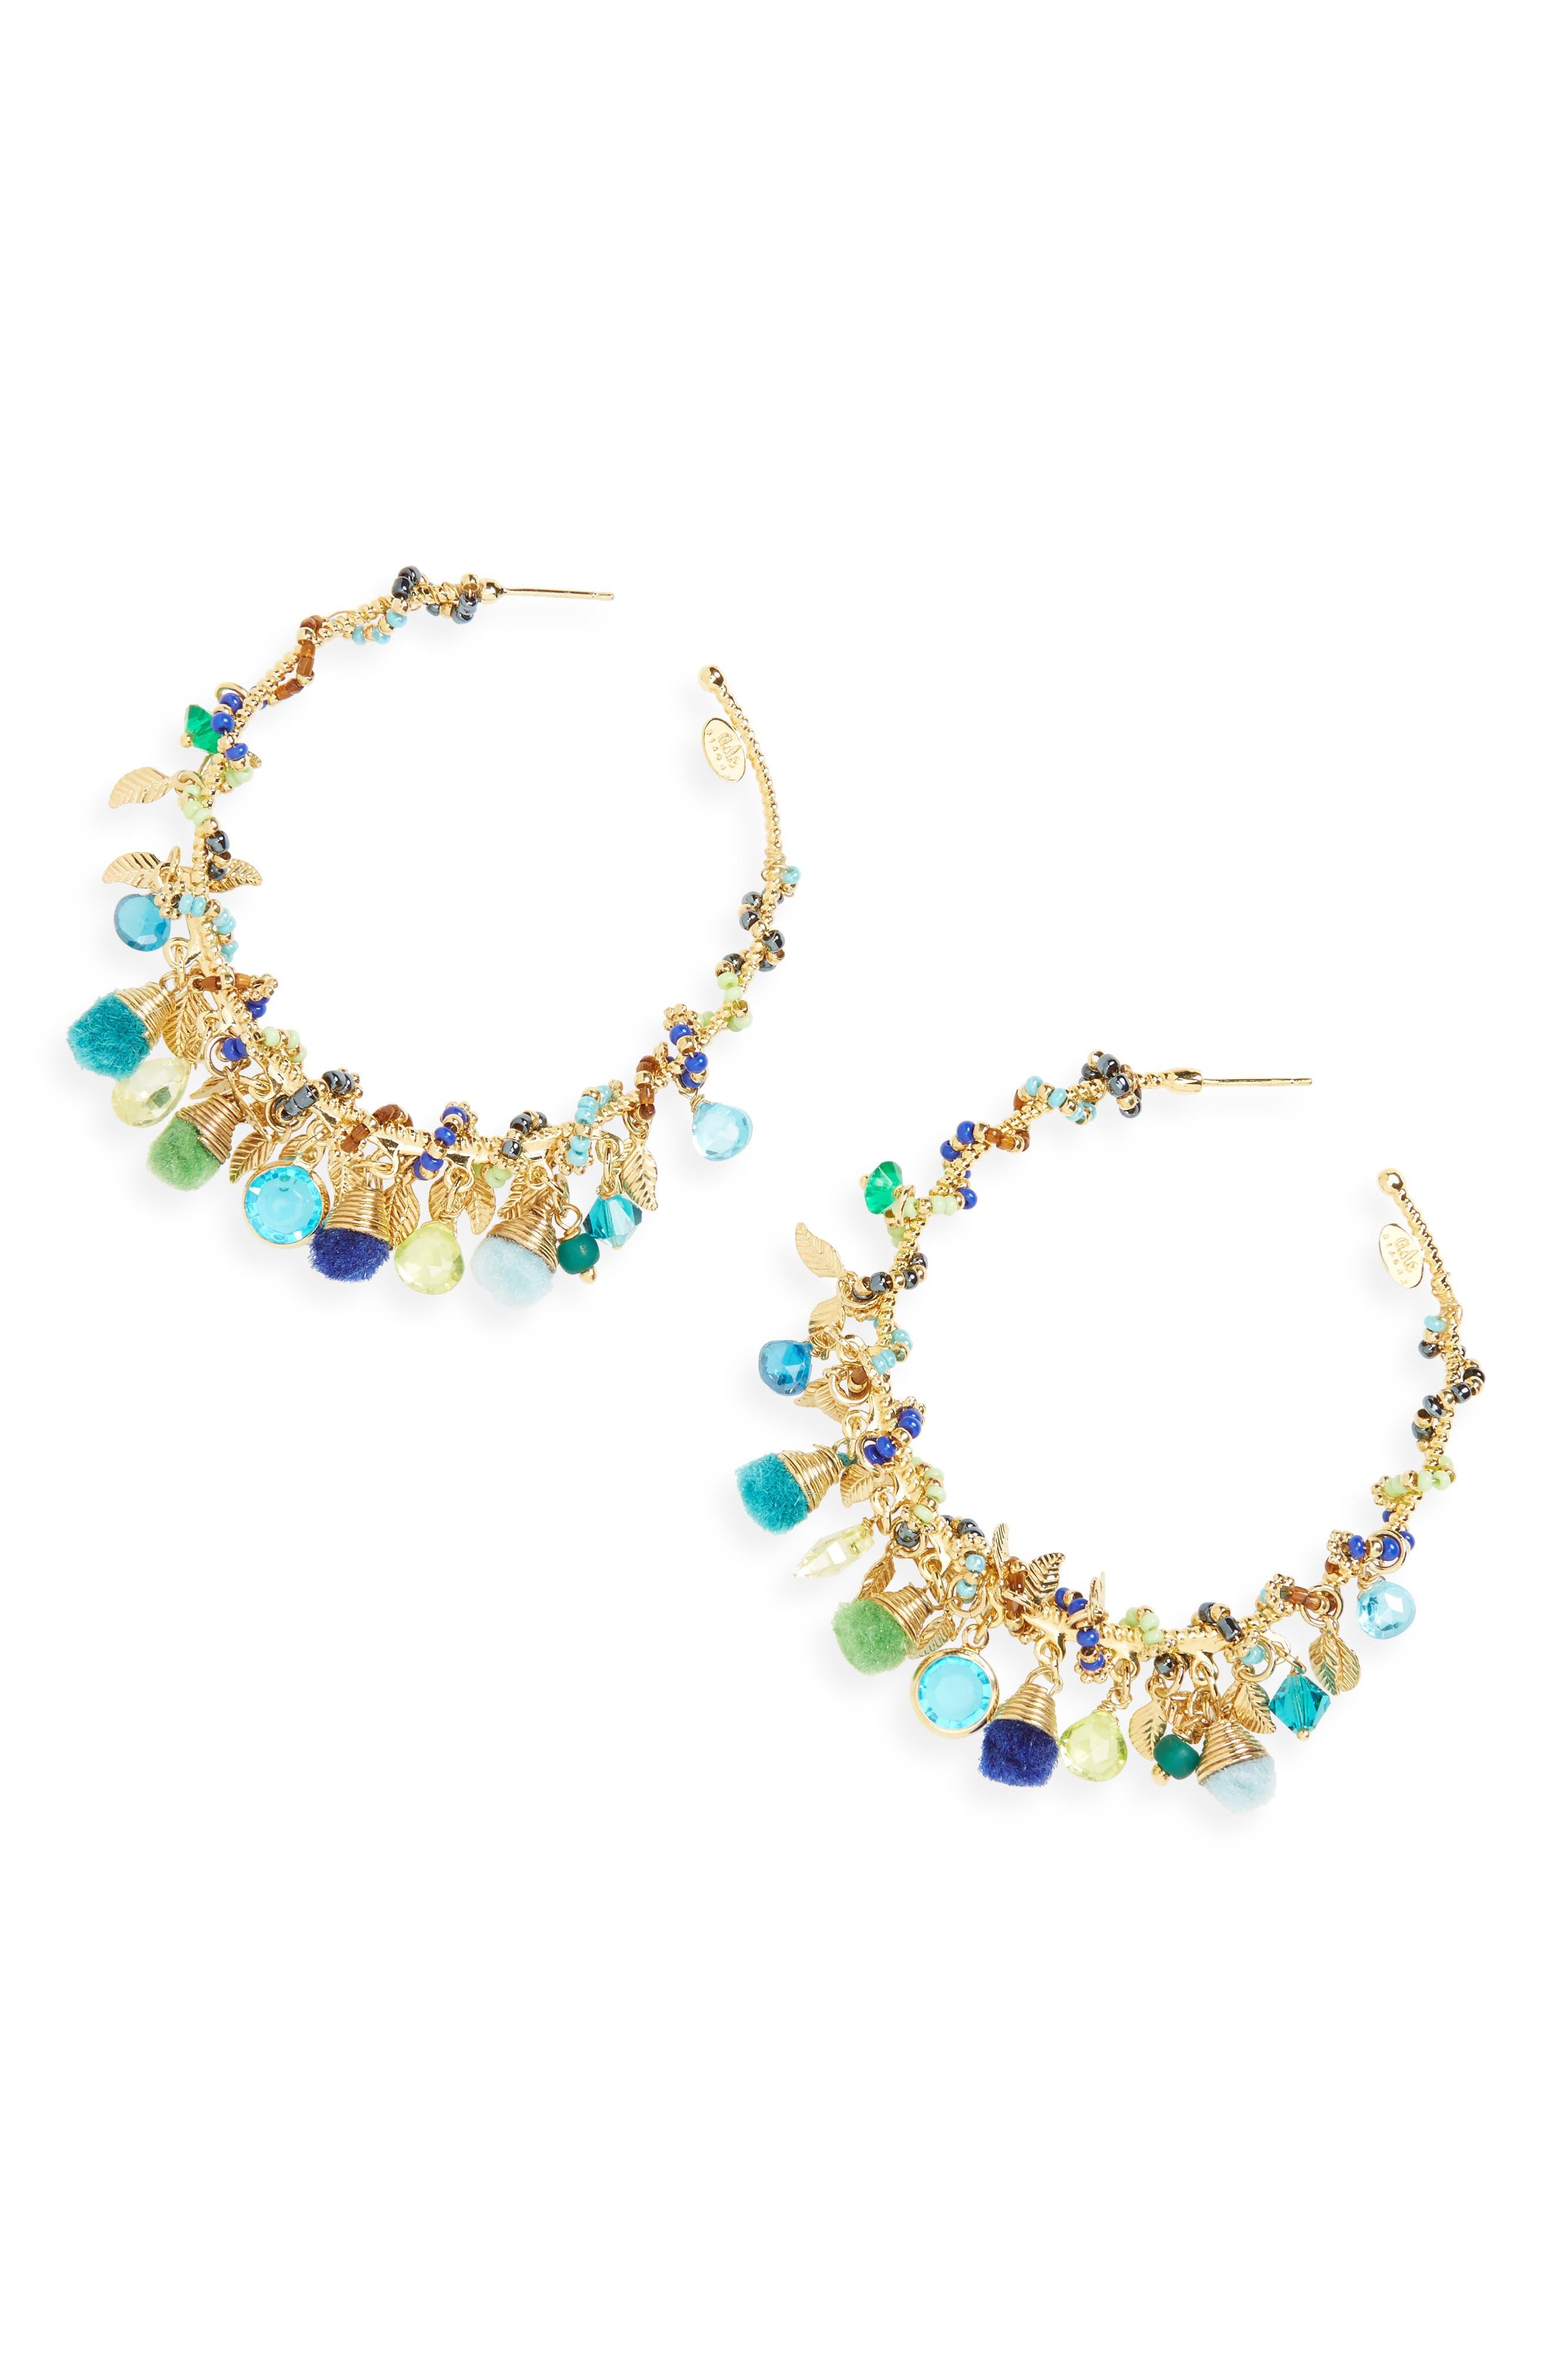 Folia Hoop Earrings,                         Main,                         color, Blue Green/ Gold